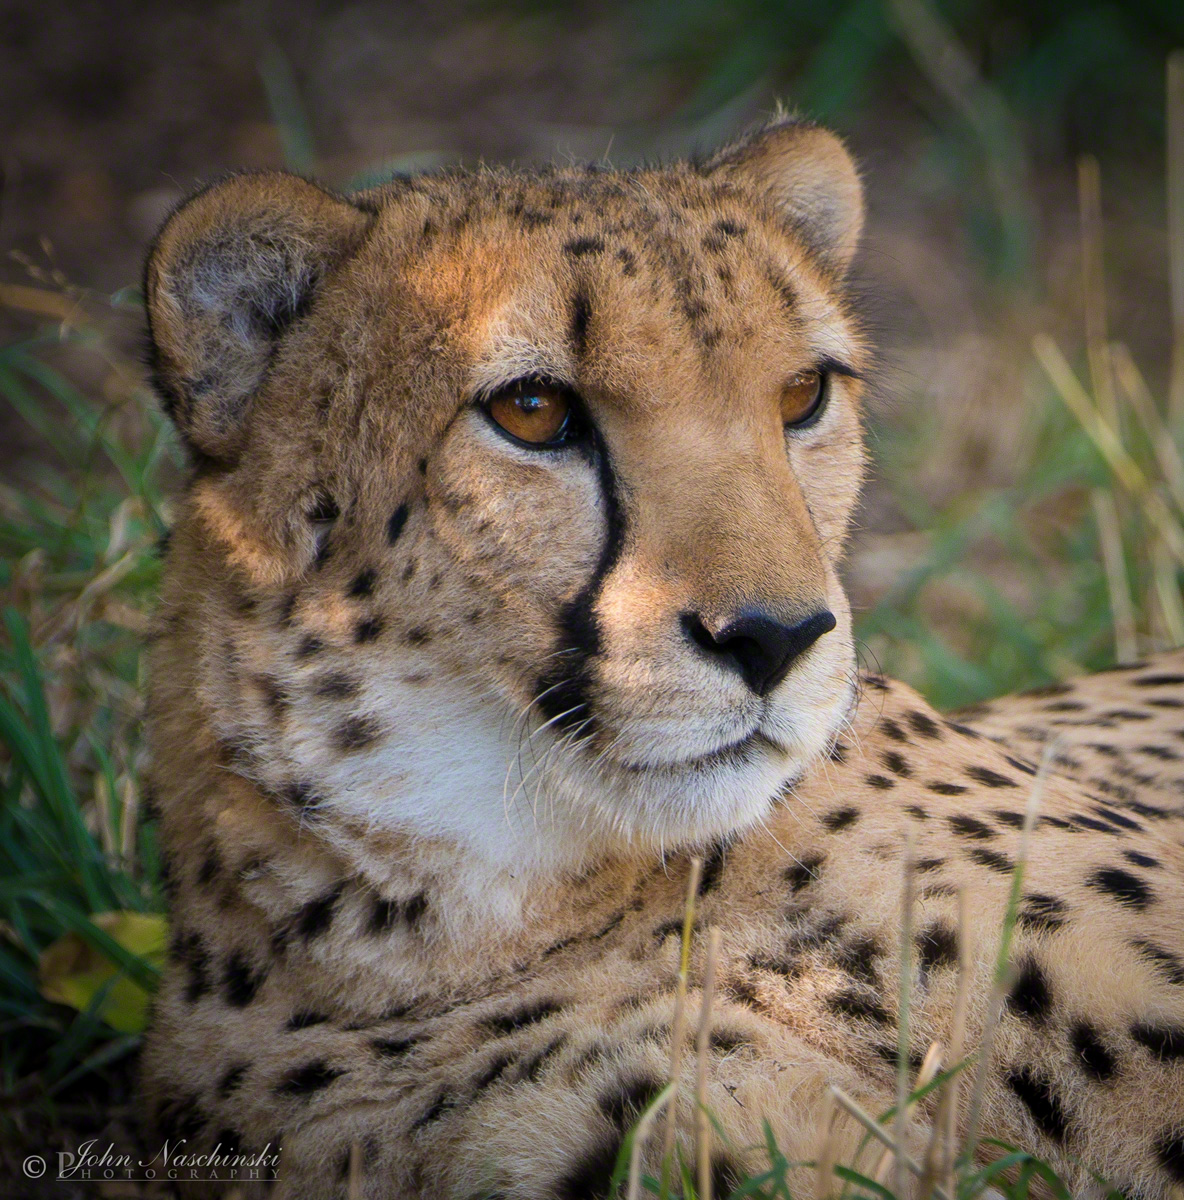 Denver Zoo Free Days: Photos From Denver Zoo